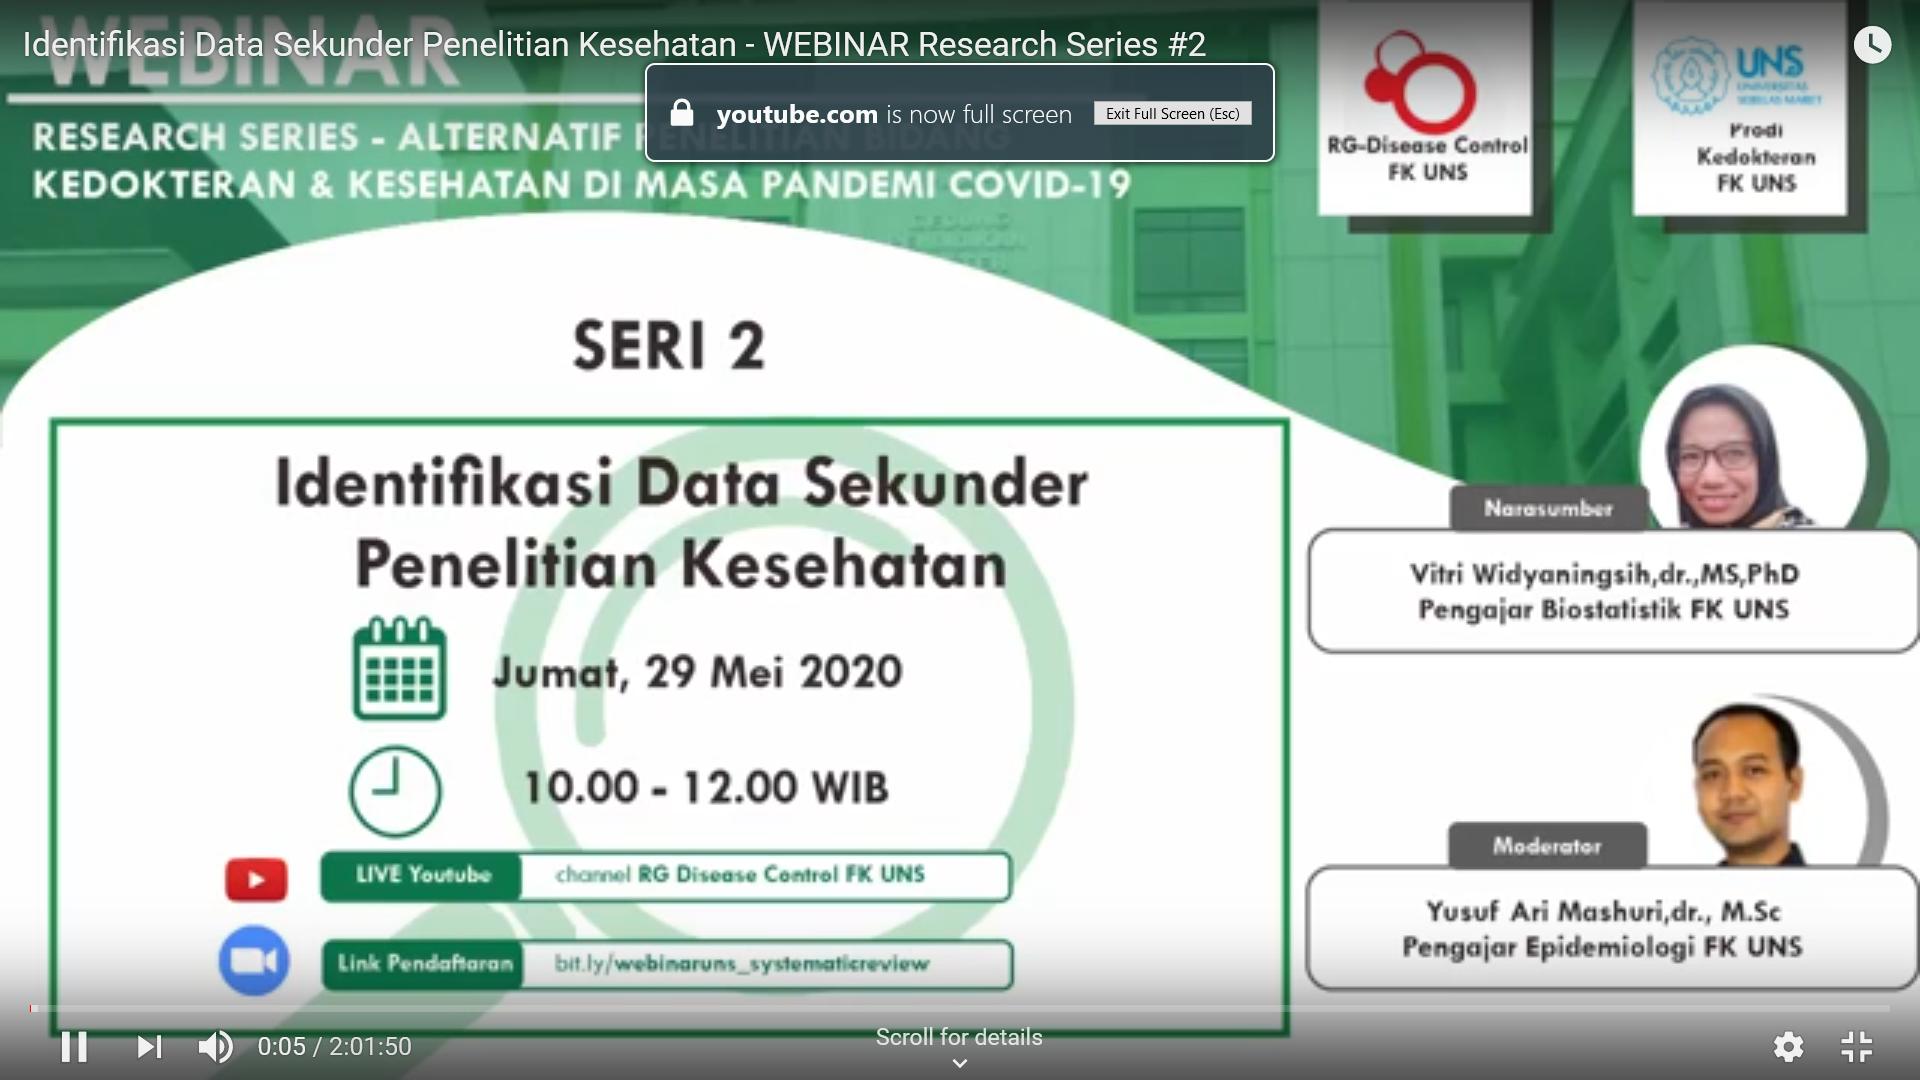 Webinar Prodi Kedokteran FK UNS-RG Disease Control FK UNS Identifikasi Data Sekunder Penelitian Kesehatan